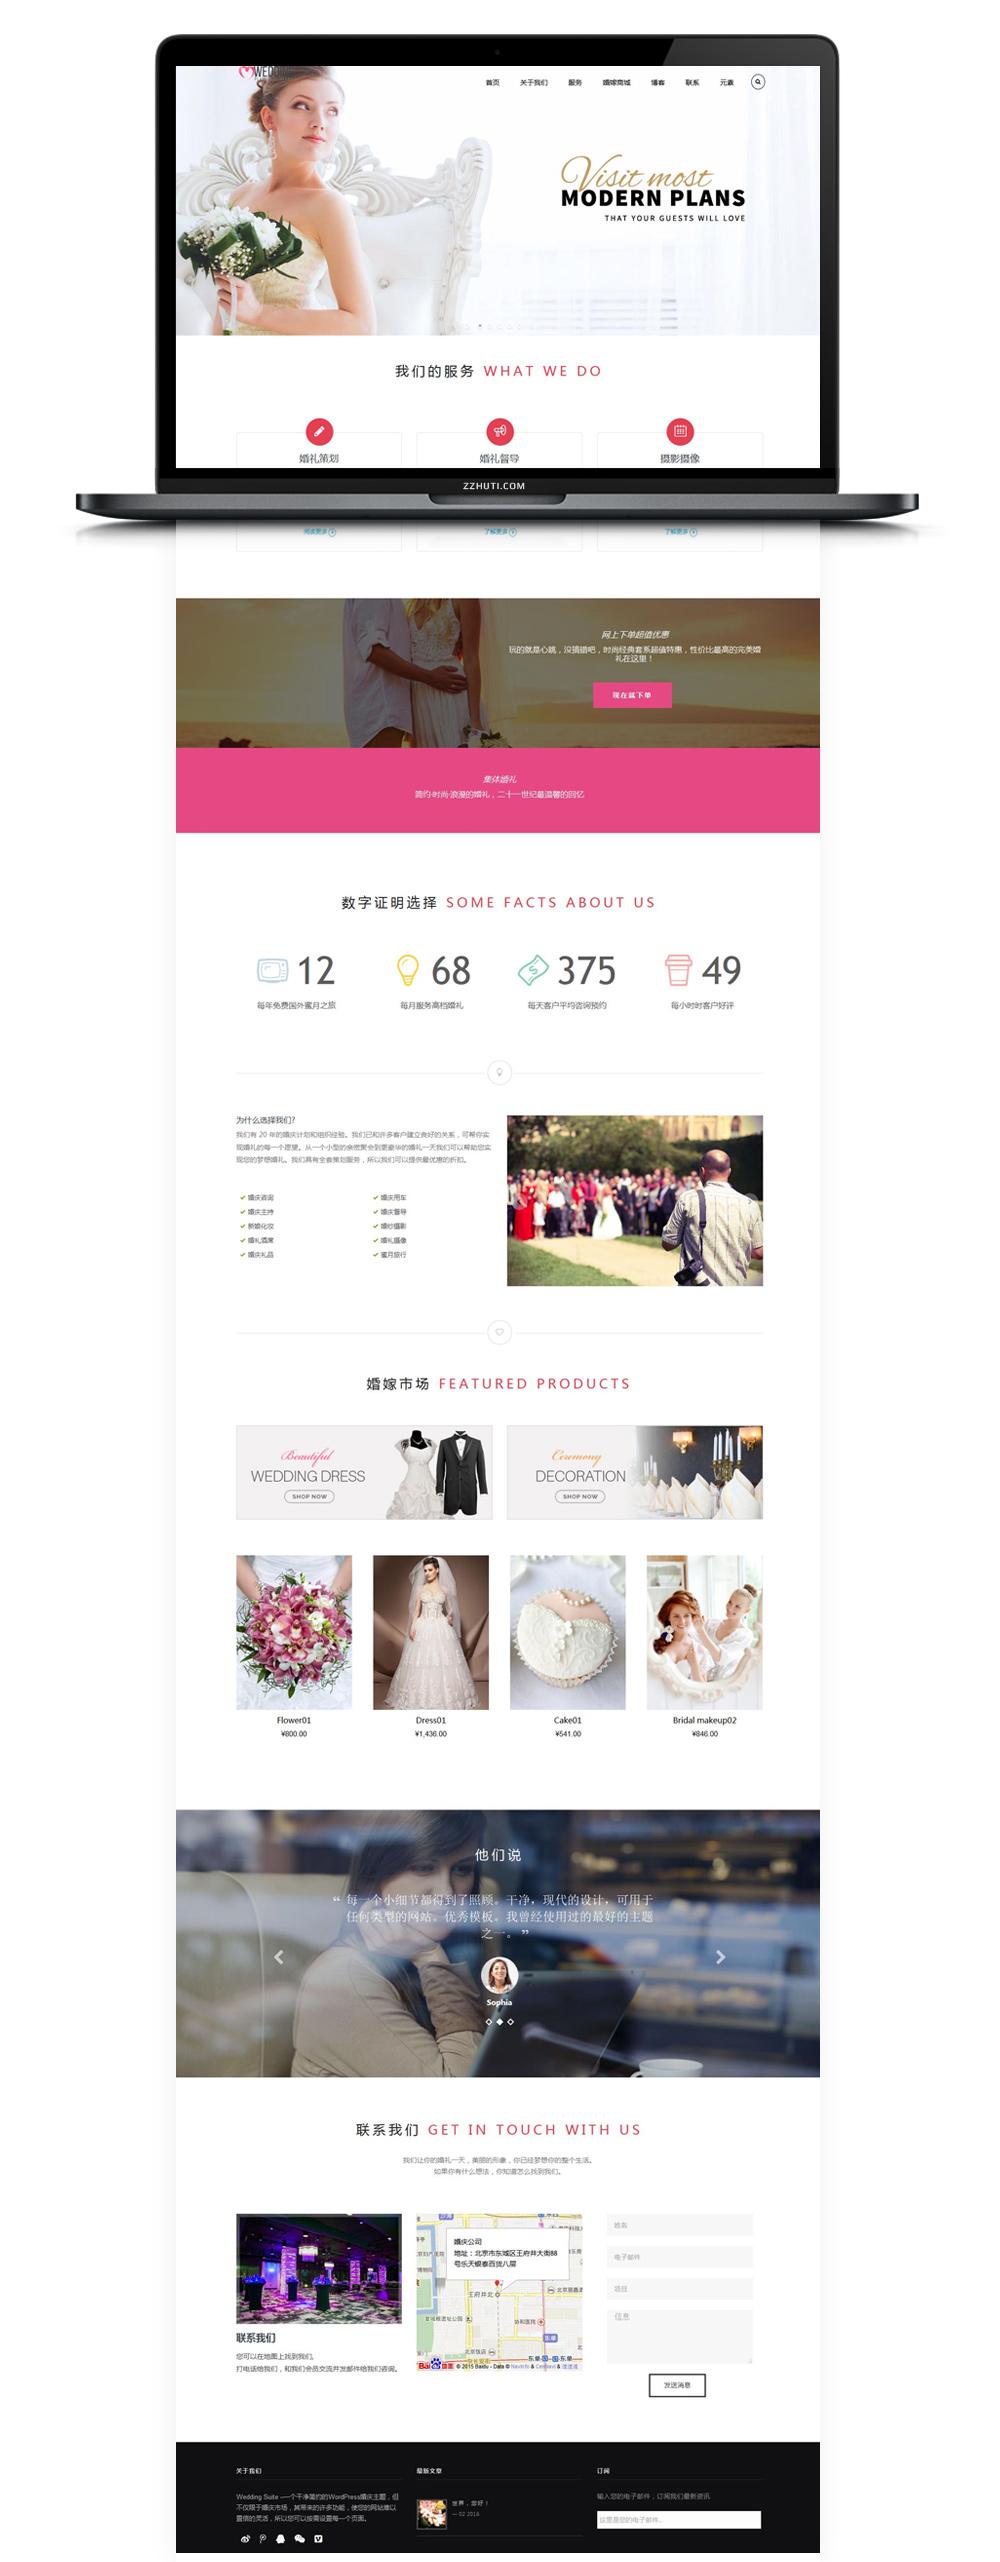 【Wedding Suite主题V2.6.4】WP婚礼婚庆展示销售带商城礼品企业网站模板[WordPress主题]-找主题源码